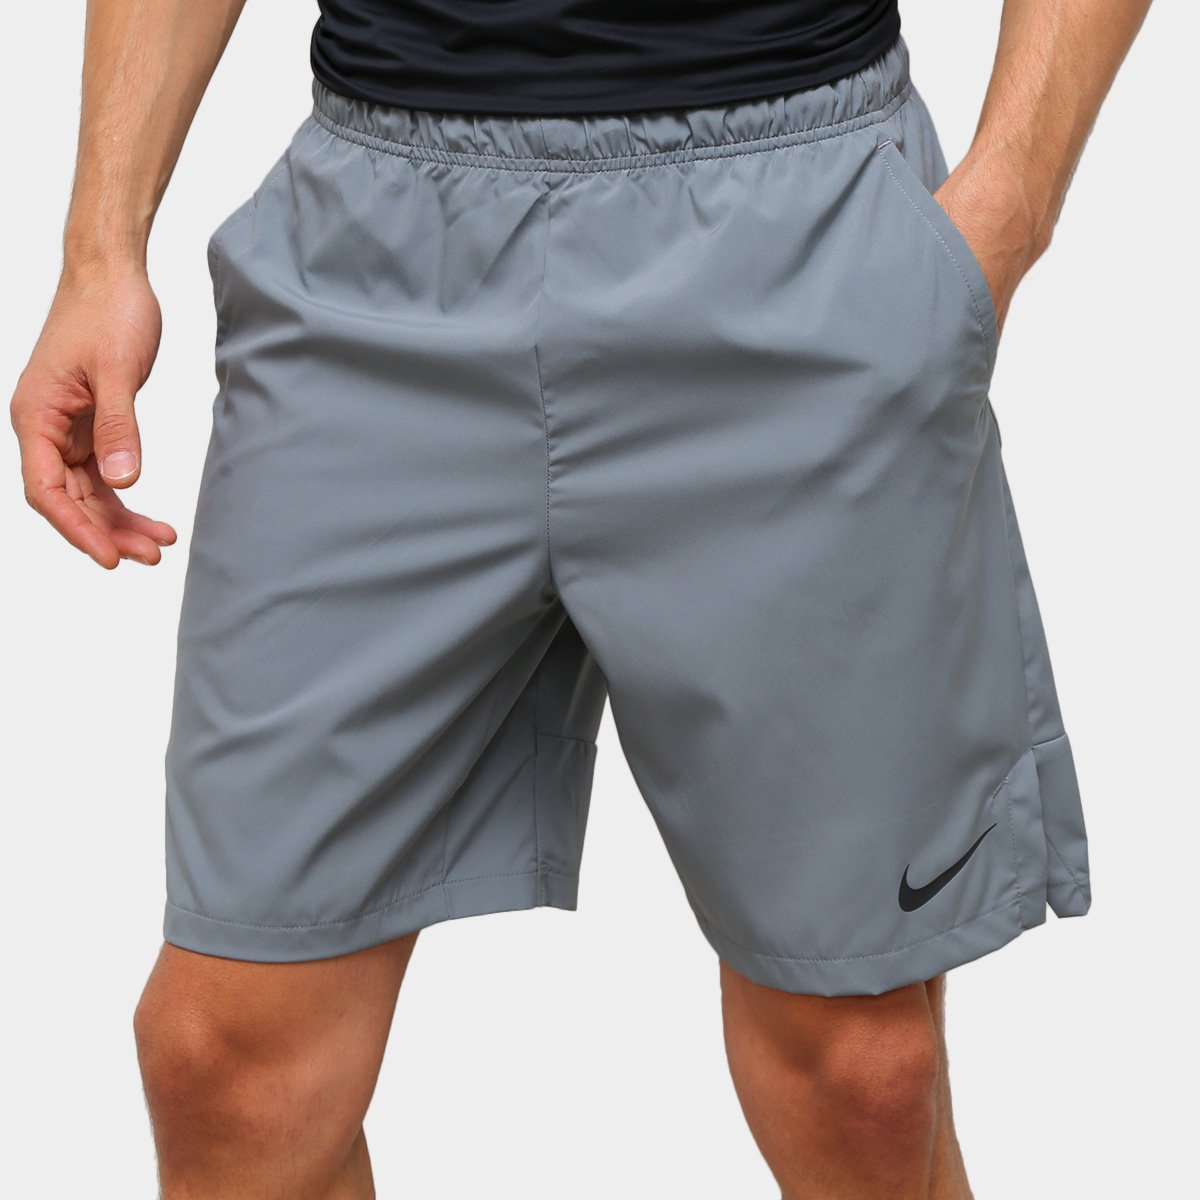 Bermuda Nike Woven 3.0 Masculina - Cinza  - PROTENISTA